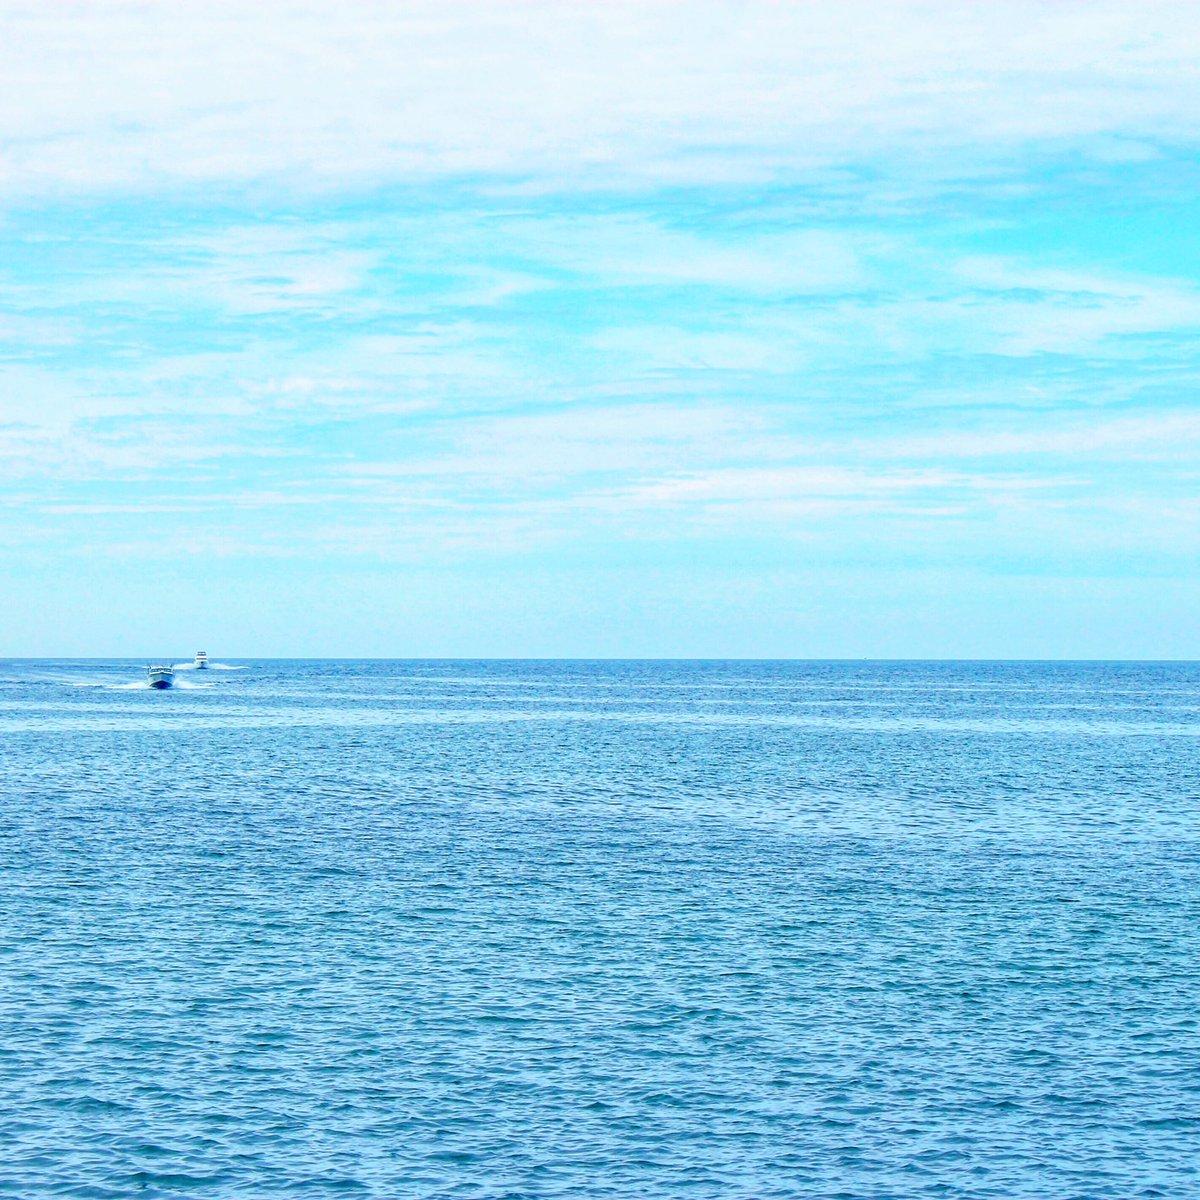 Don't mind me, I'm just looking for my happiness. ⭐️ @Saugatuck @PureMichigan #saugatuckdouglas #PureMichigan #ww #tt #ttot #lakemichigan #TwitterNatureCommunity #gaytravel #travelinfluencer #travelphotography #armchairtravel #virtualtravel #TravelSomeDay #TravelTomorrow #nature